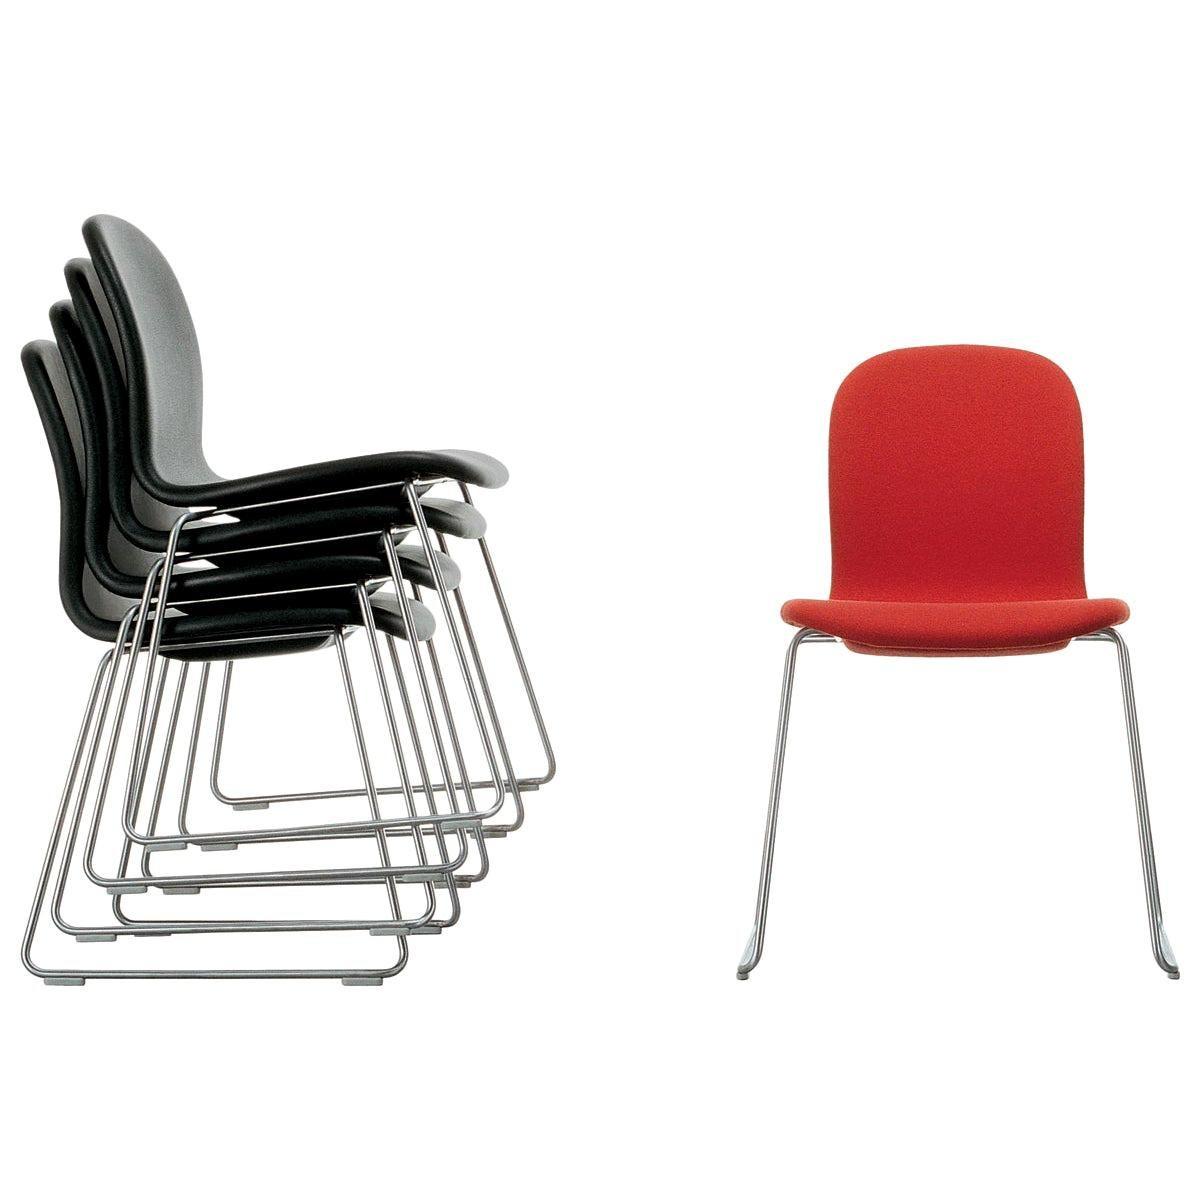 Jasper Morrison Tate Chair in Red Hero Fabric for Cappellini